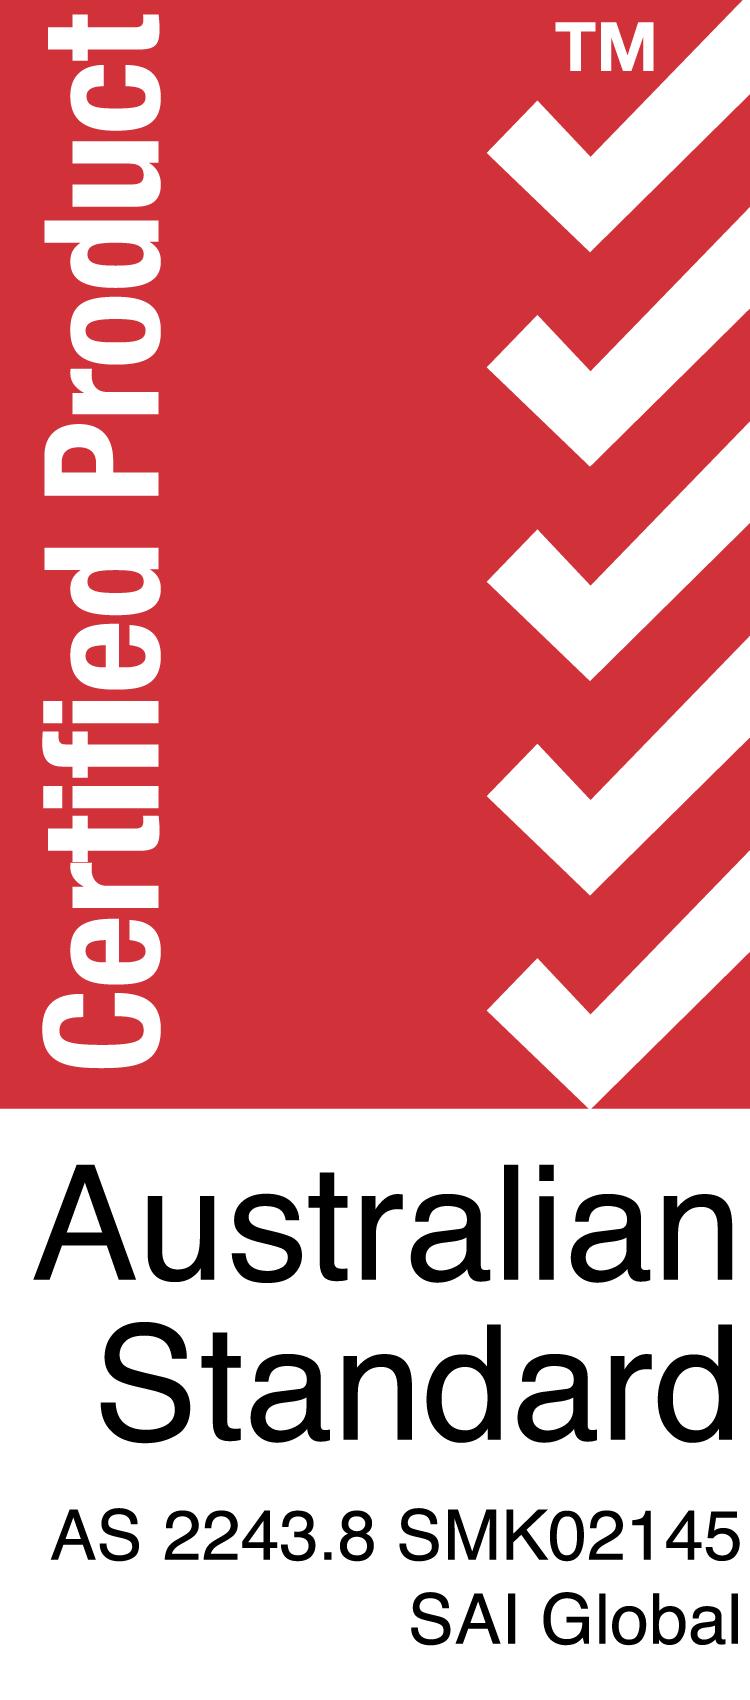 Standard mark